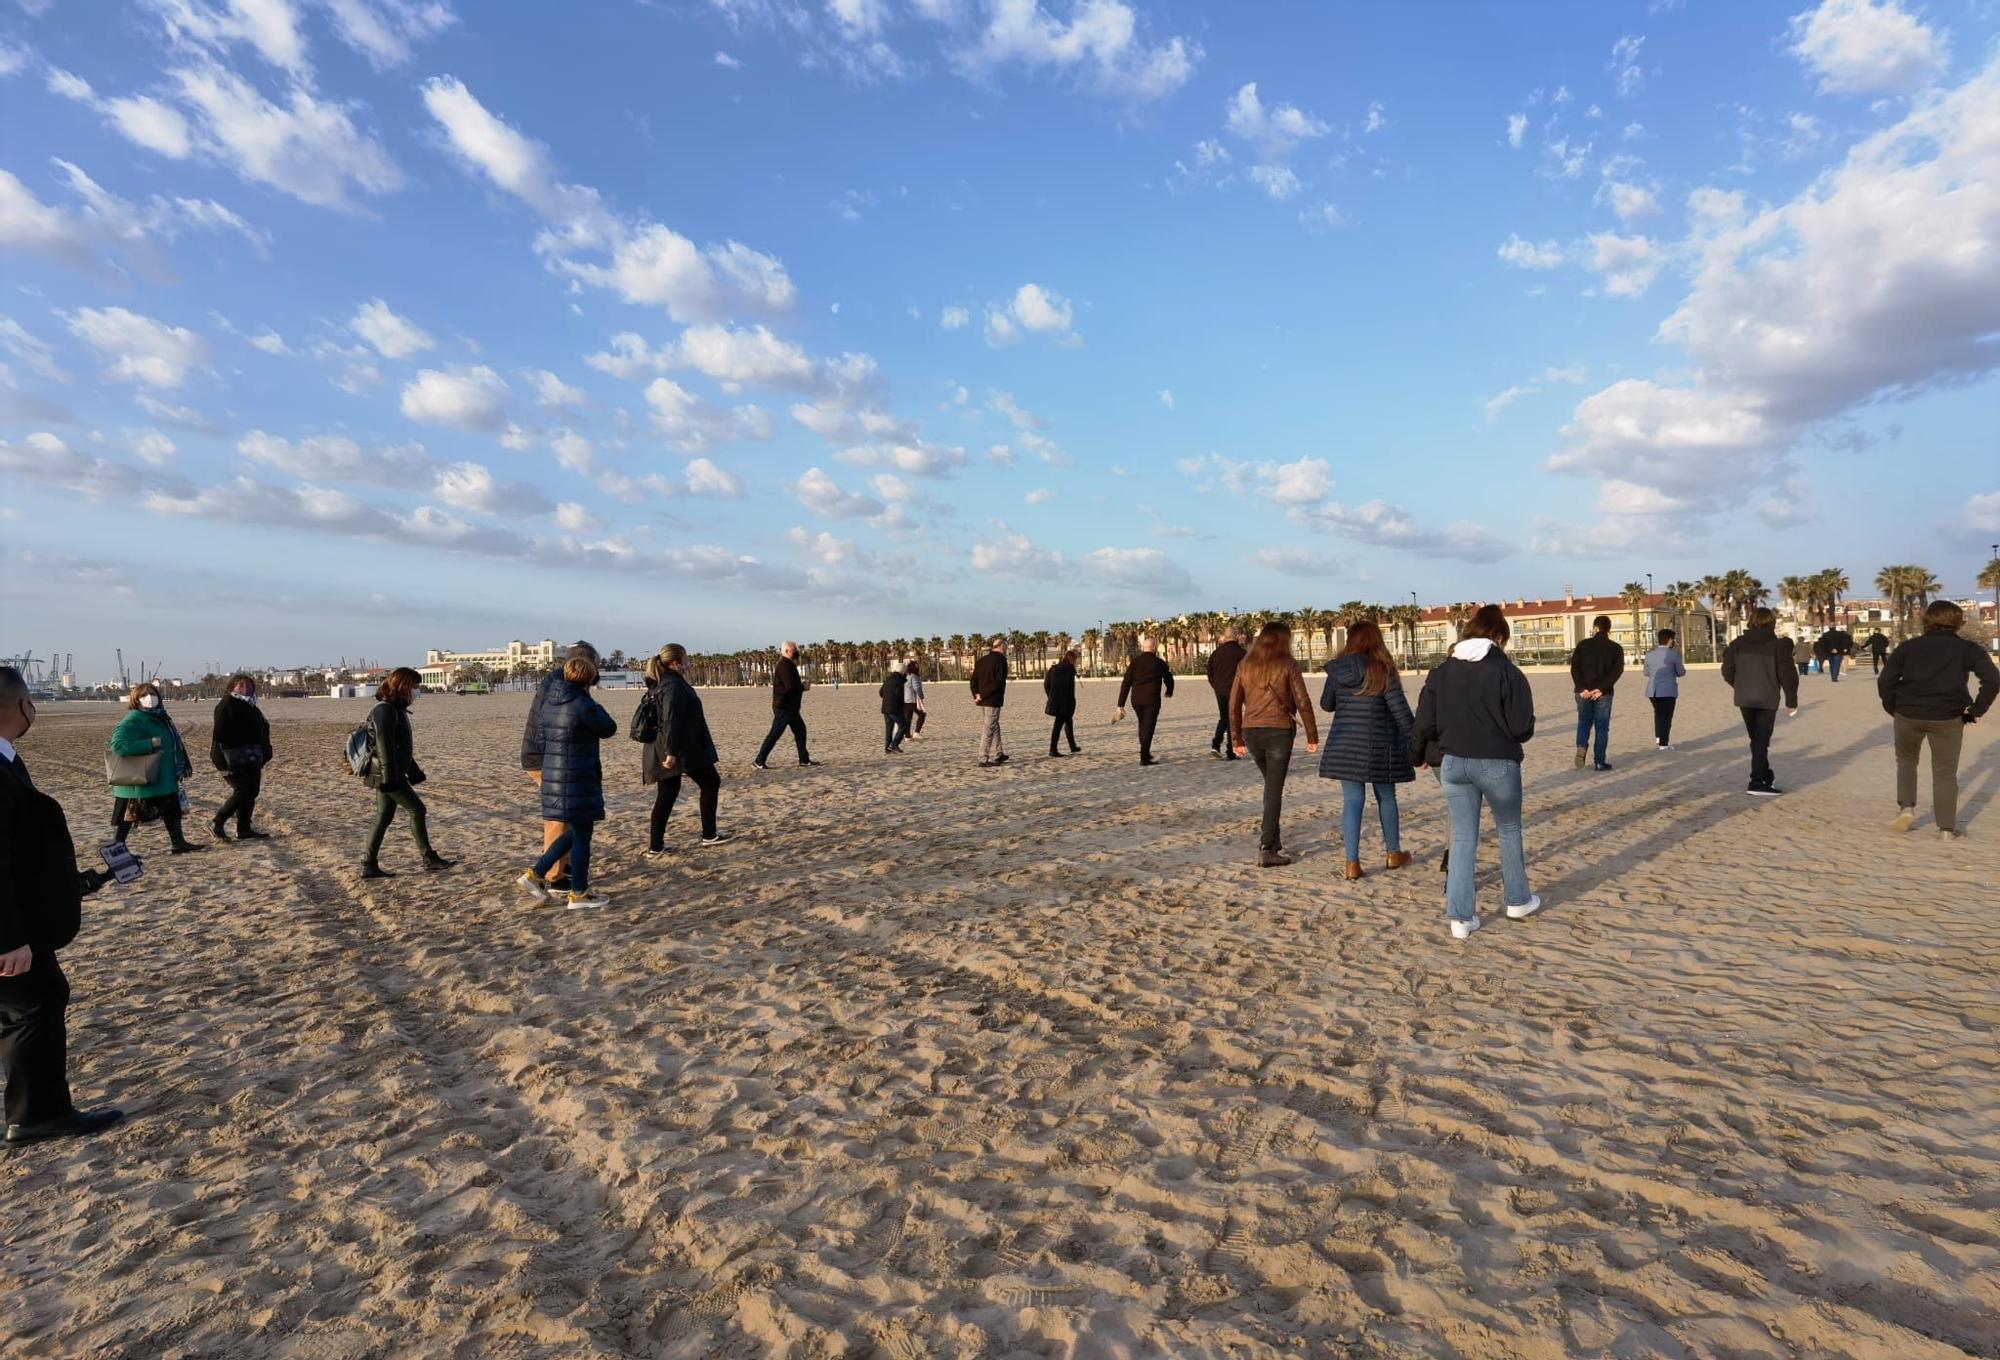 La hermandad del Cristo del Salvador acude a rezar a la playa de El Cabanyal